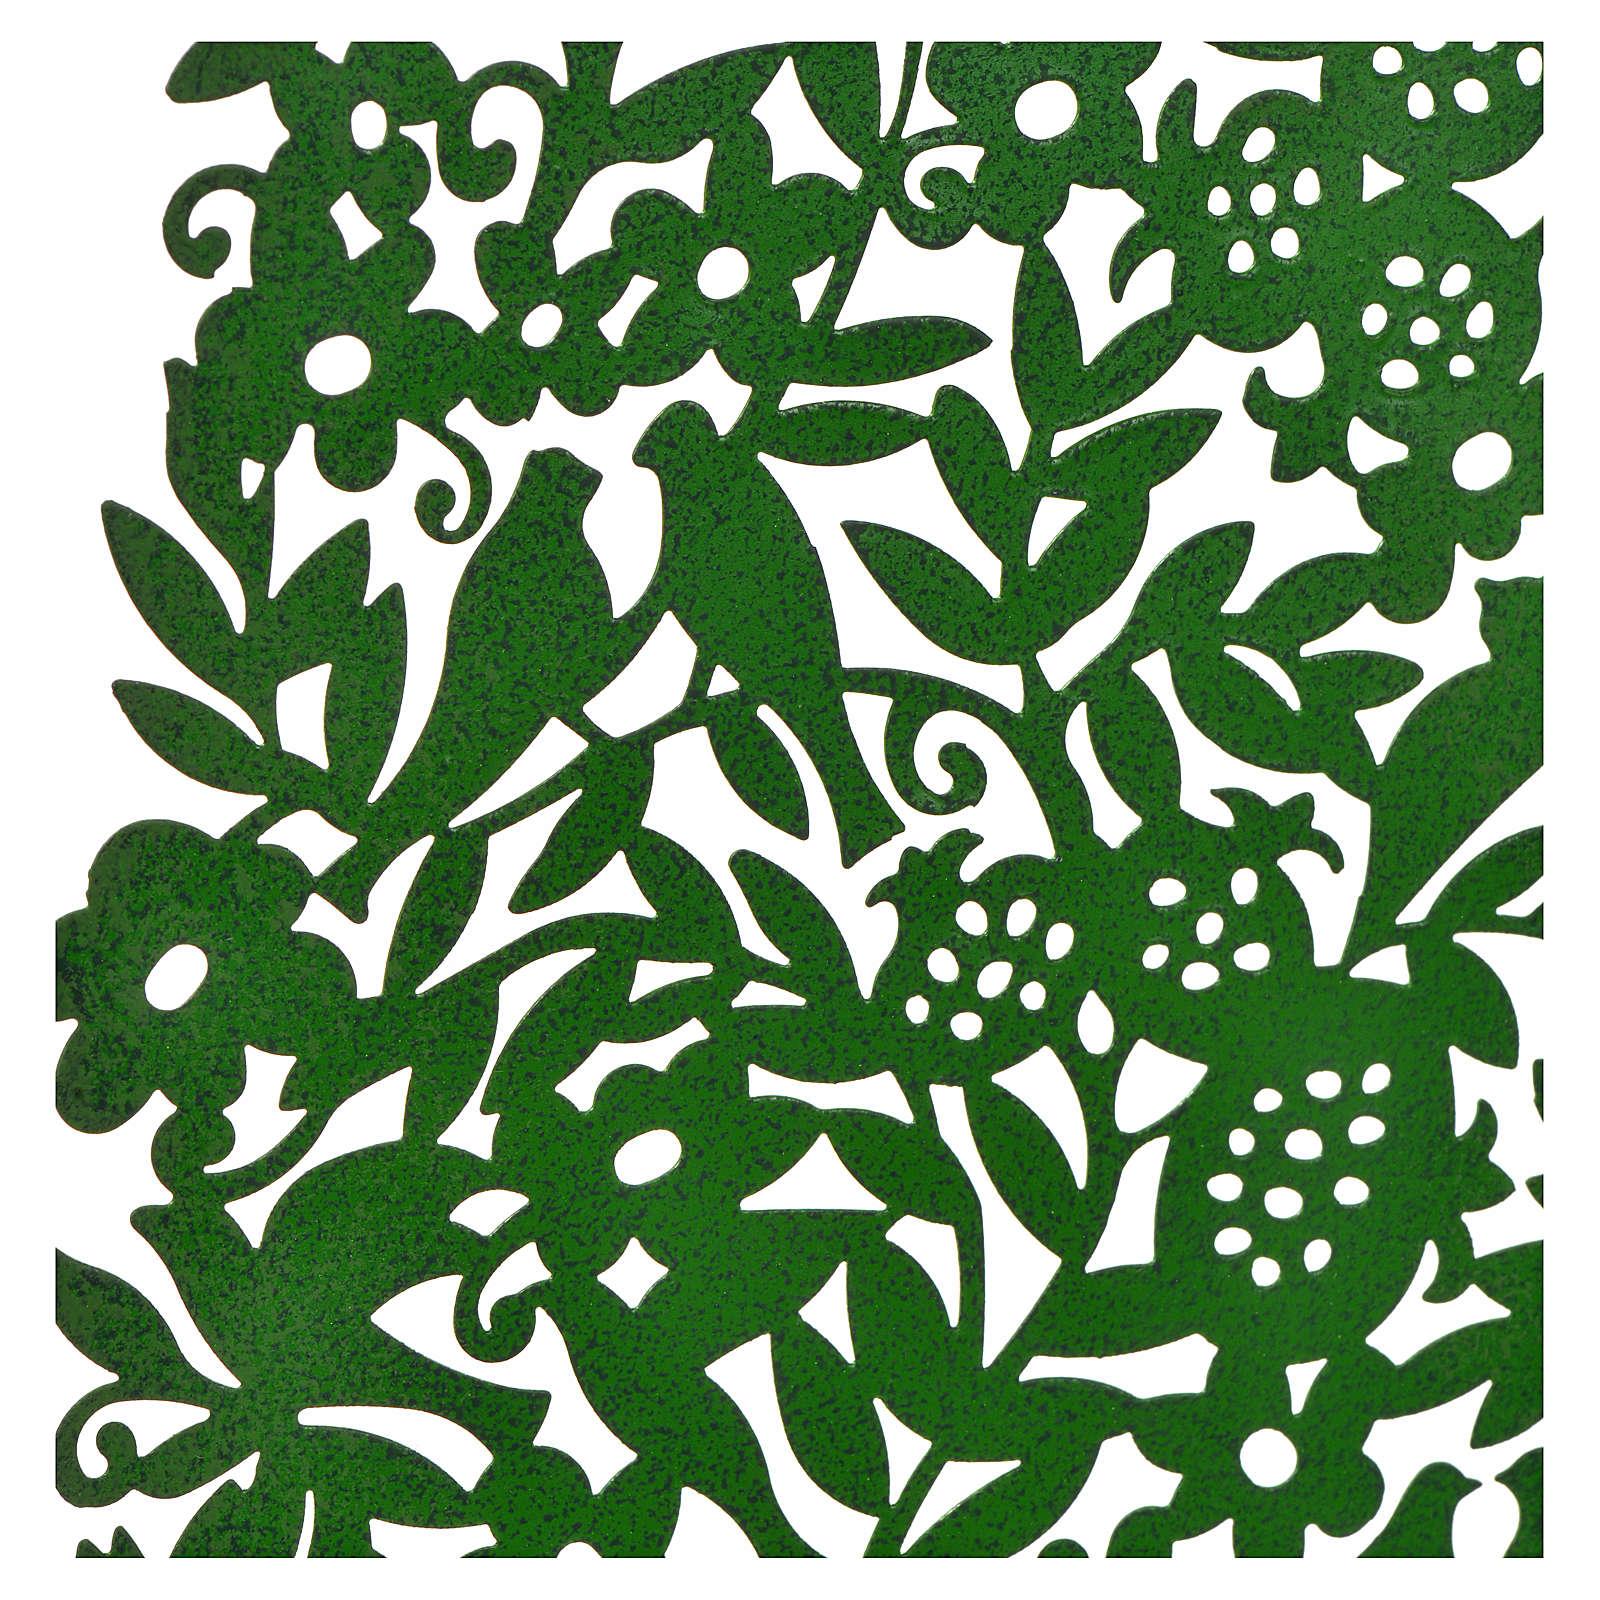 Willow Tree - The Silhouette (Perfil de Árbol) 4